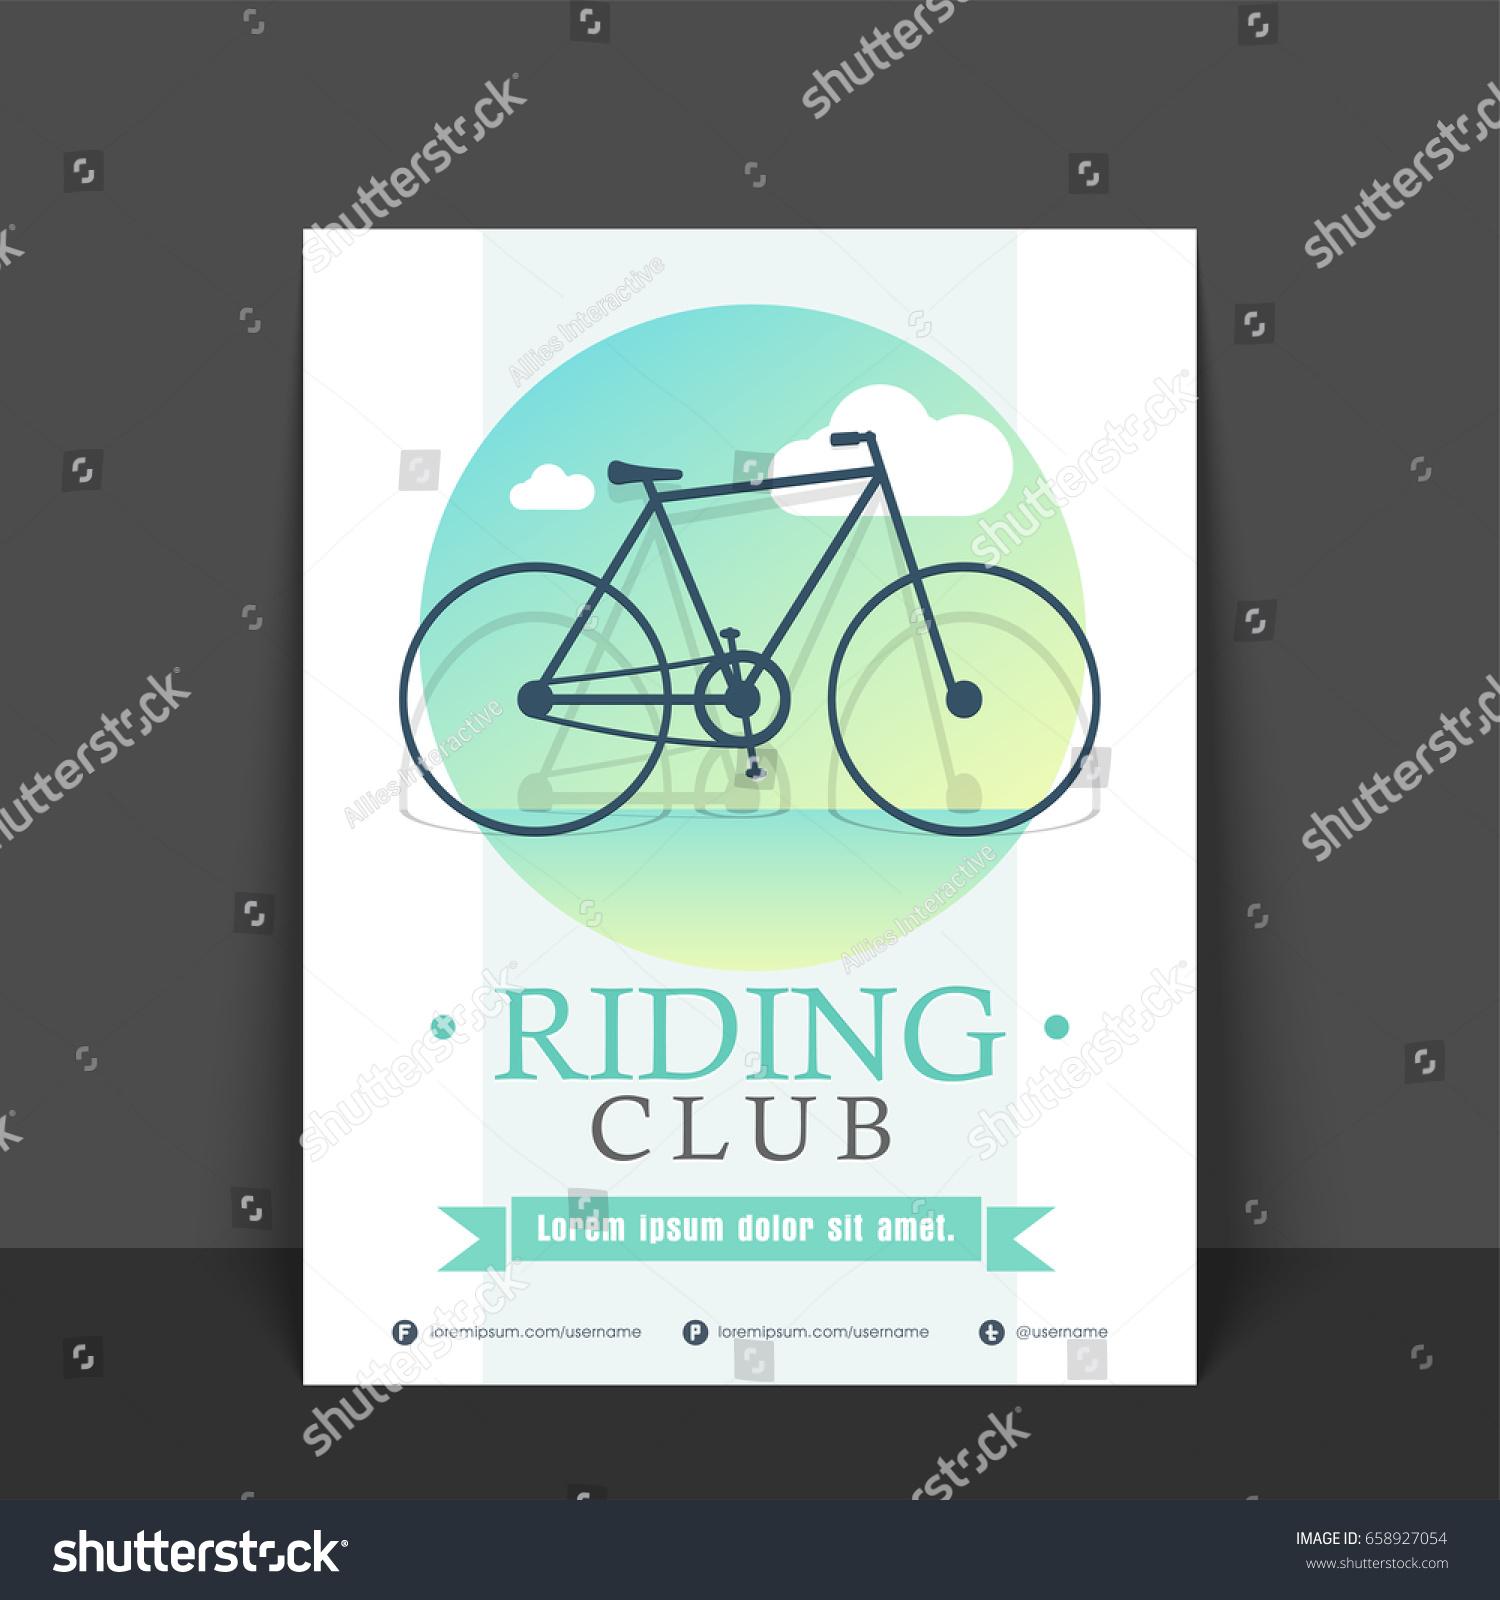 riding club flyer template banner design のベクター画像素材